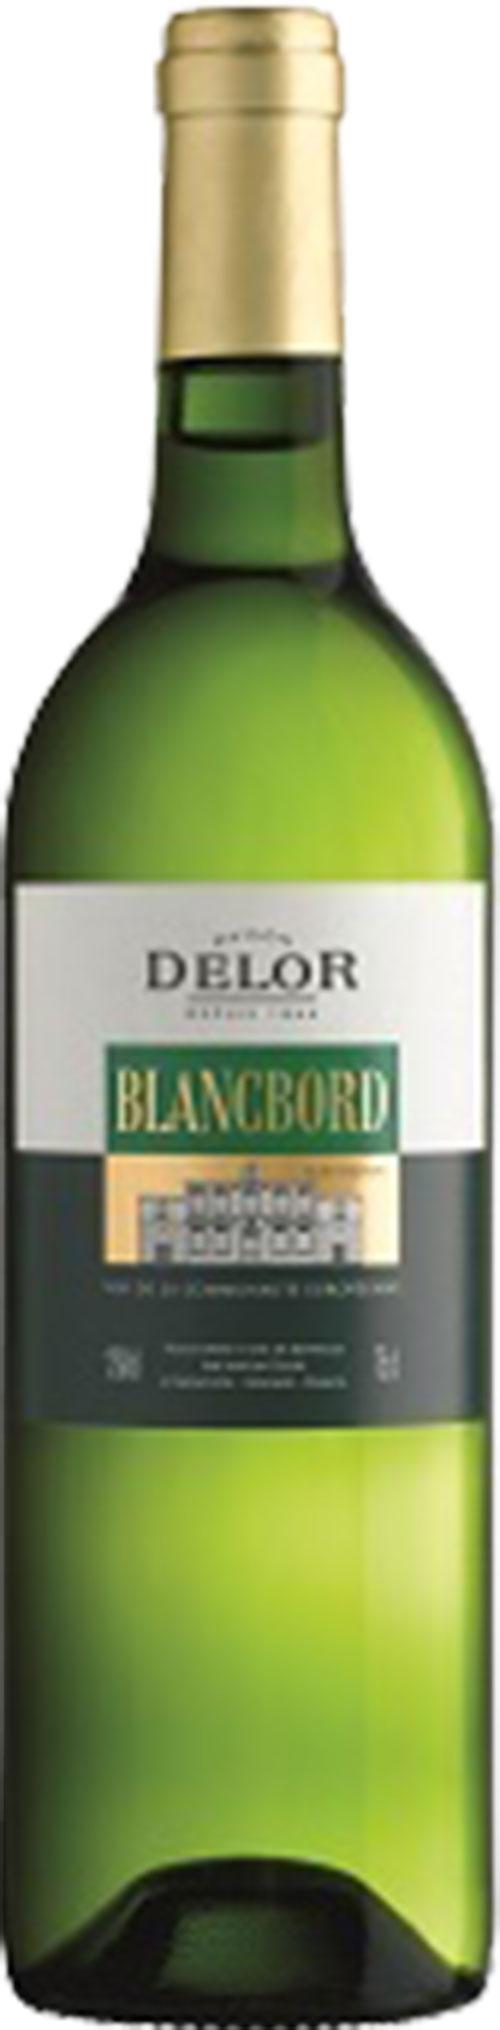 Delor Blancbord